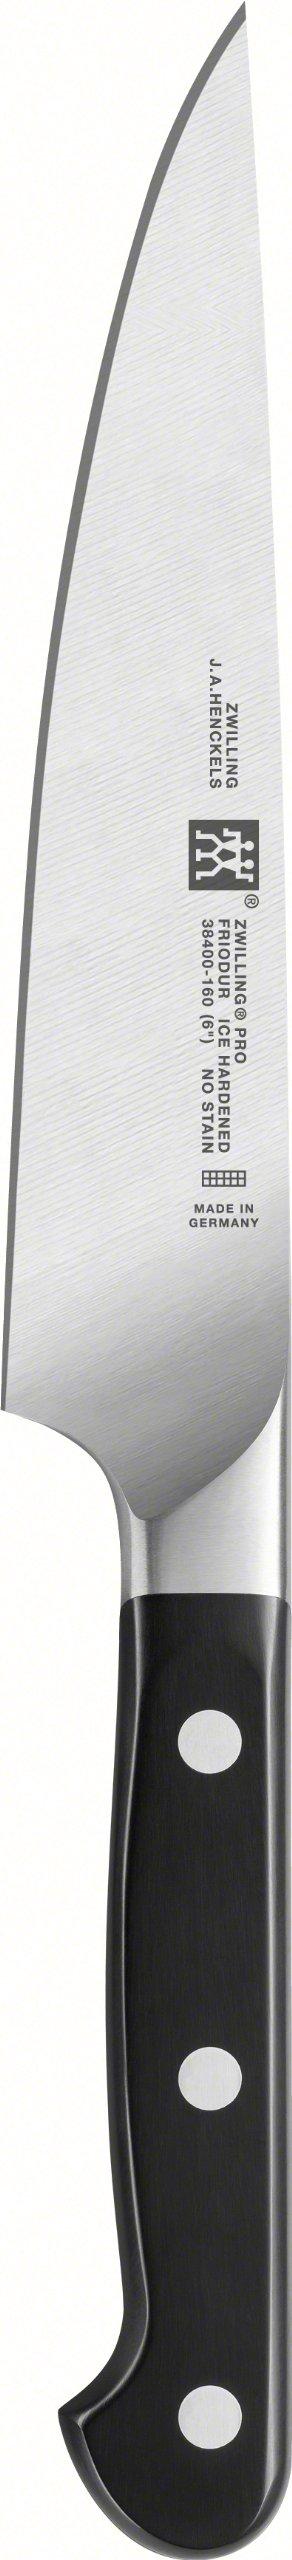 Zwilling 38400-161-0 Pro Original Slicing Knife, Silver/Black